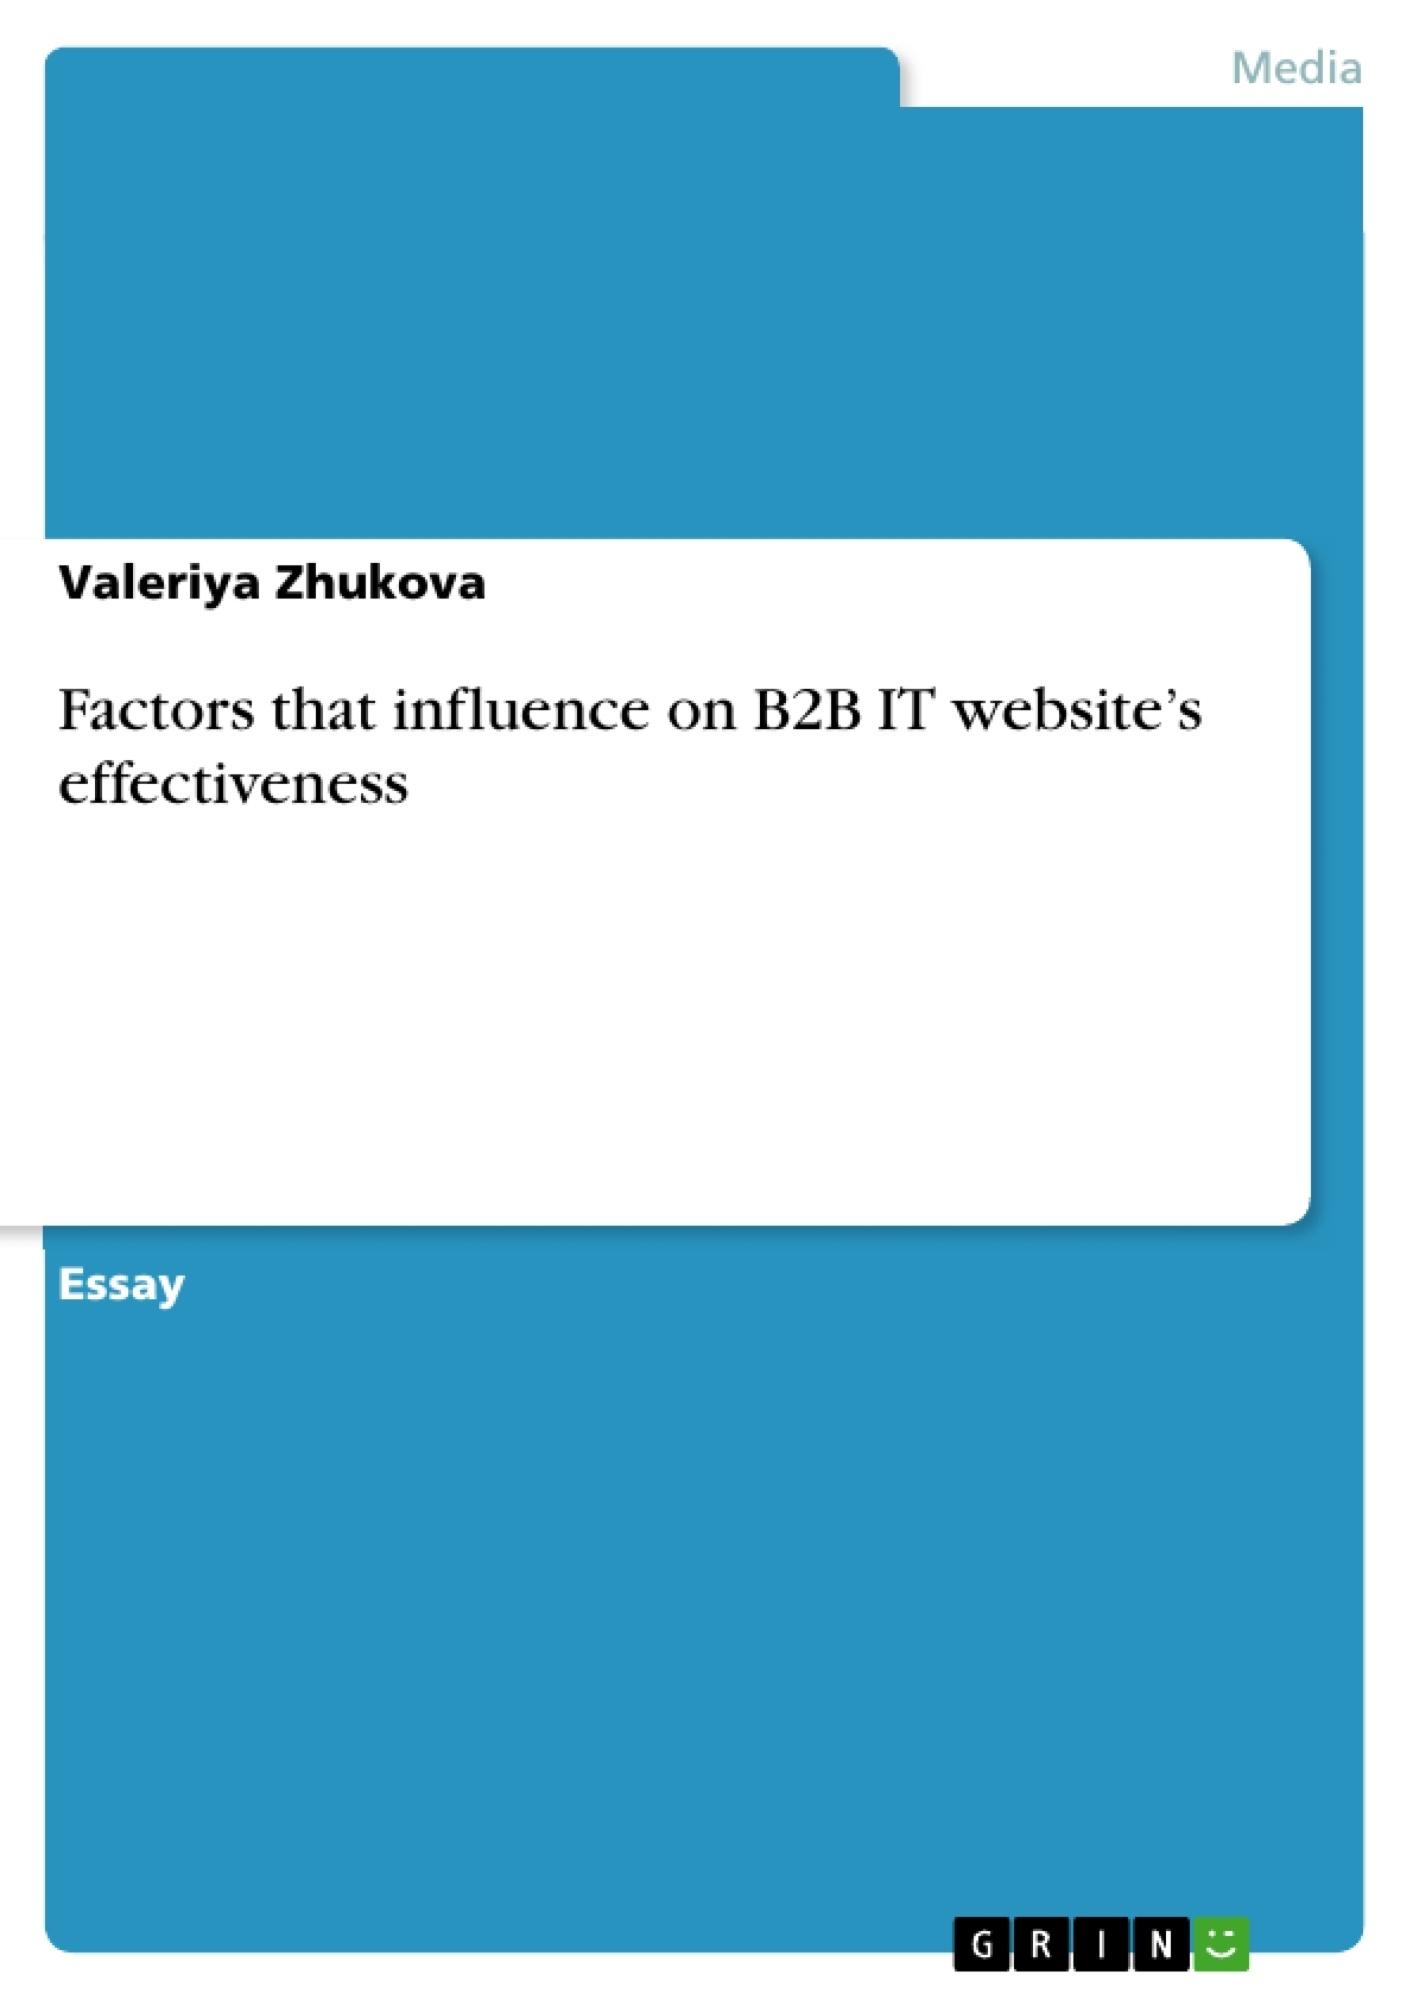 Title: Factors that influence on B2B IT website's effectiveness